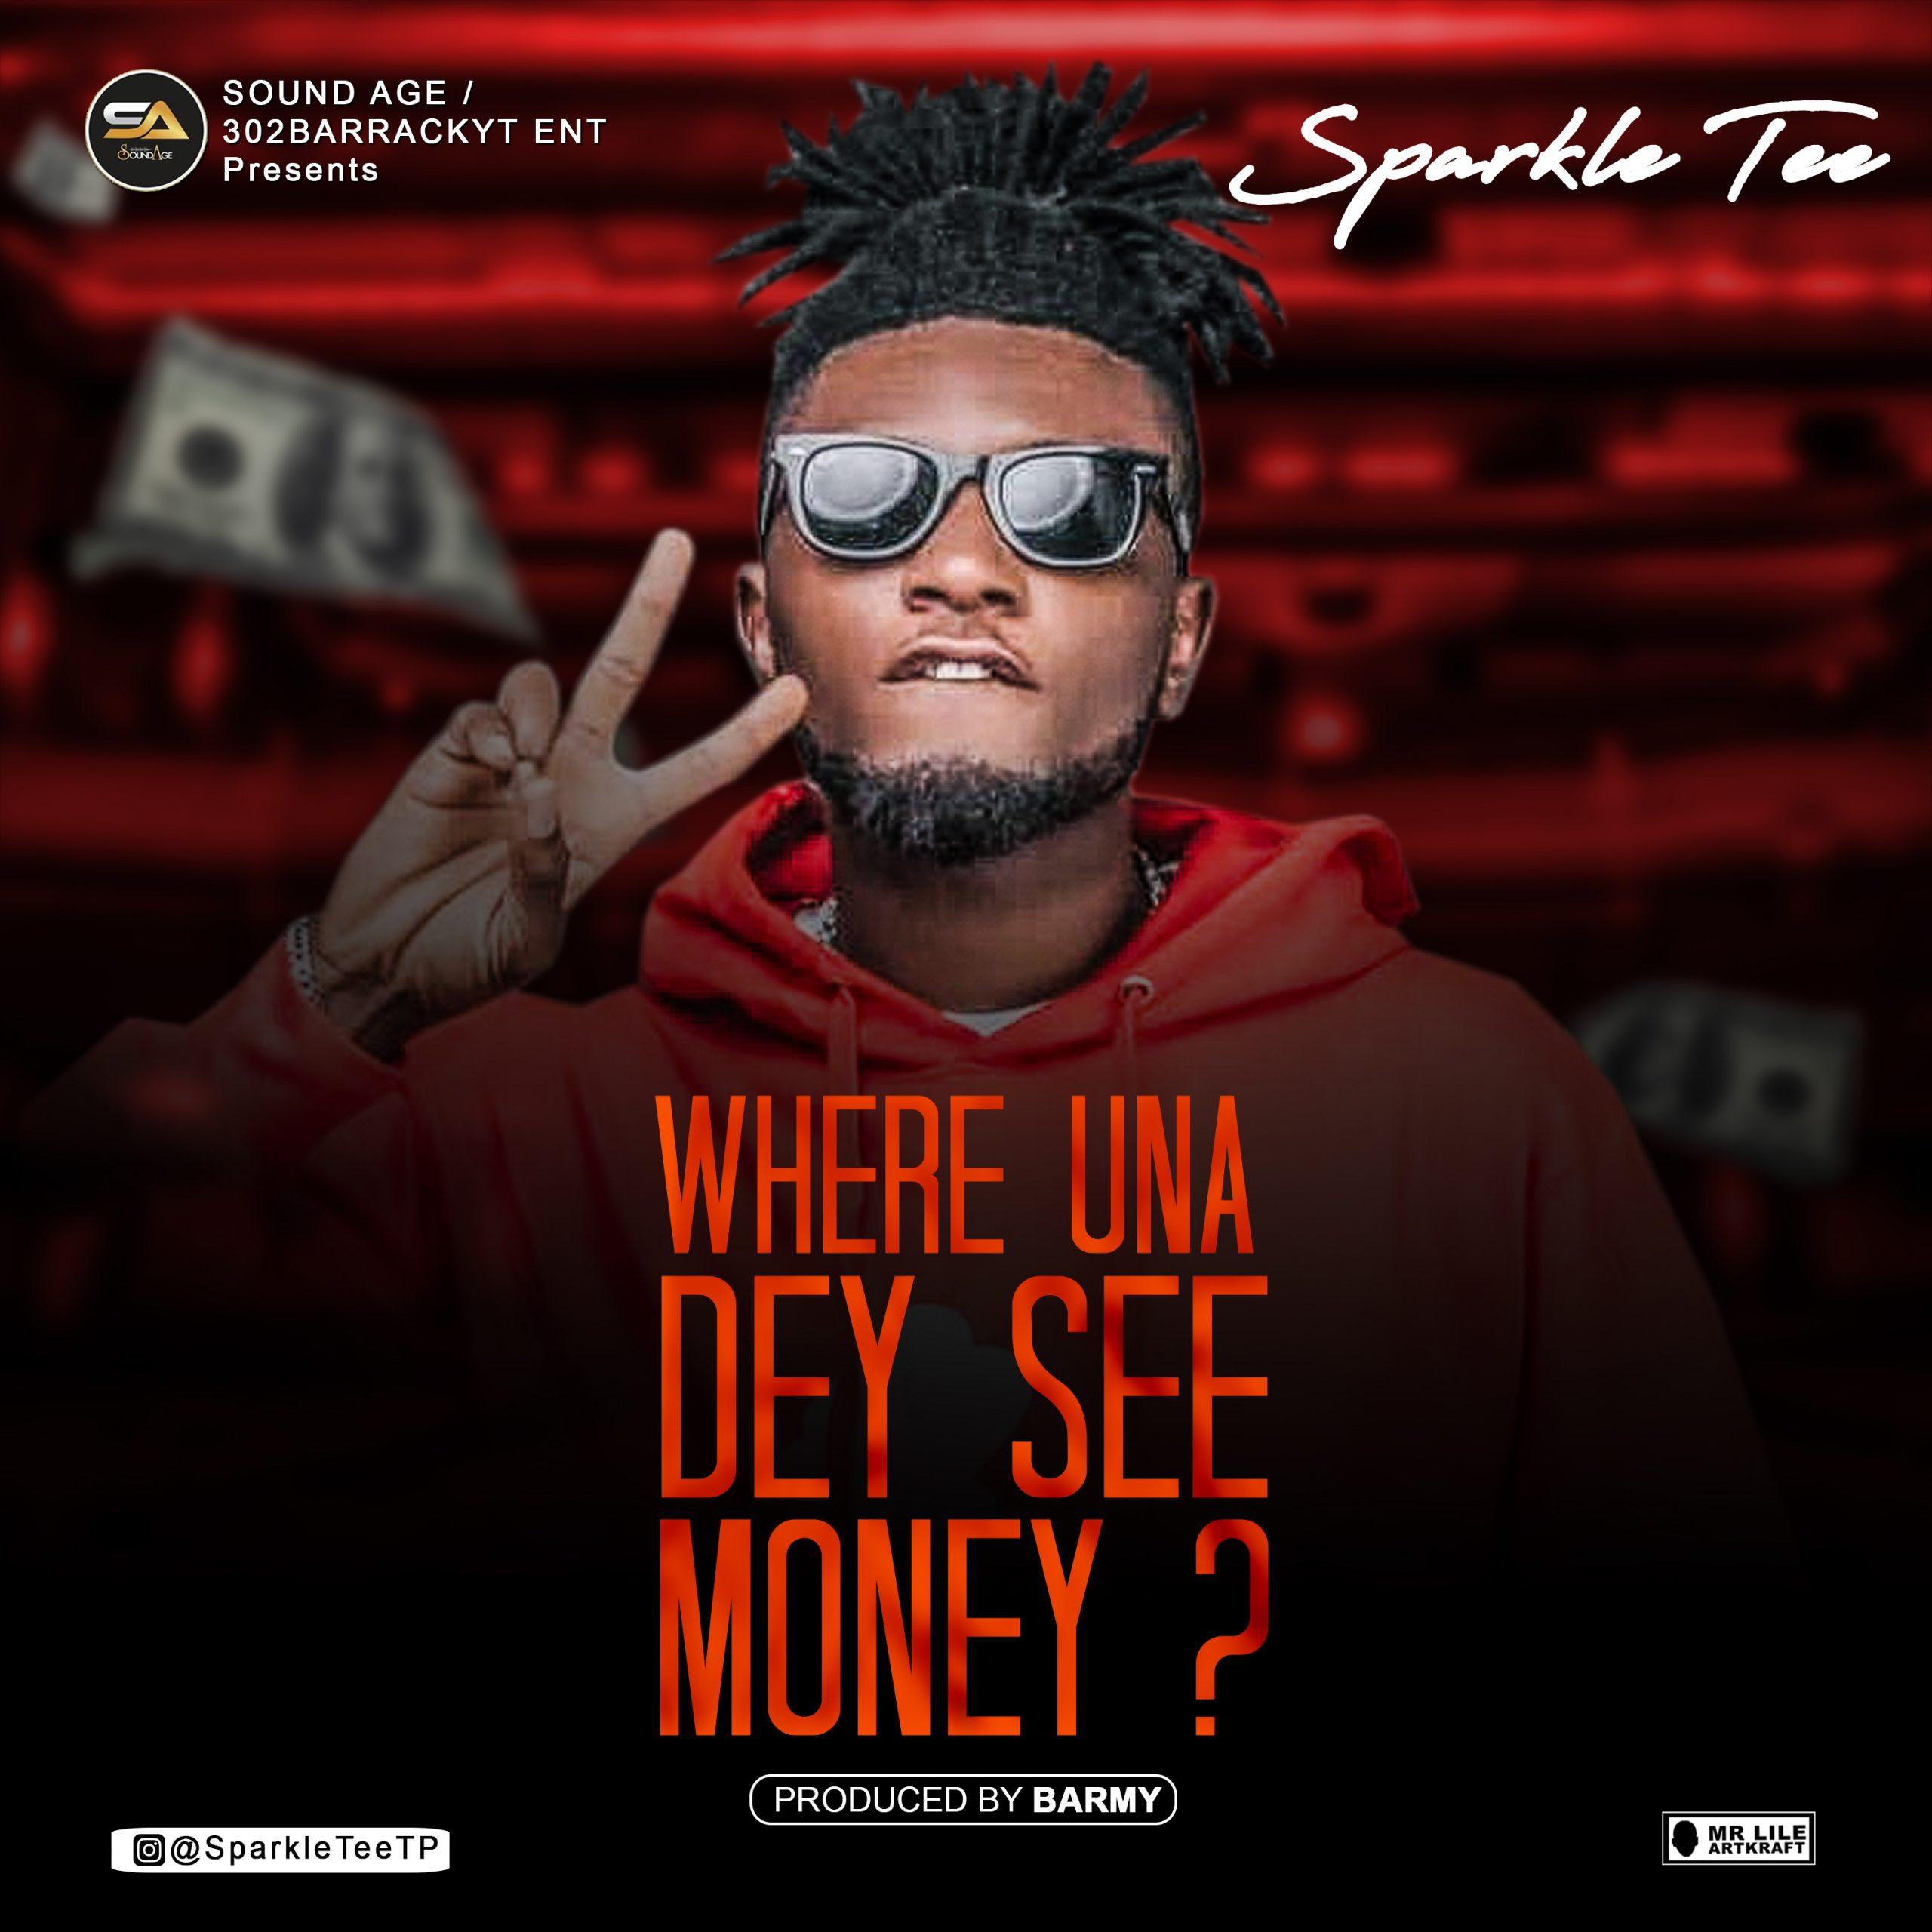 SPARKLE_TEE_WHERE_UNA_DEY_SEE_MONEY_ARTWORK3